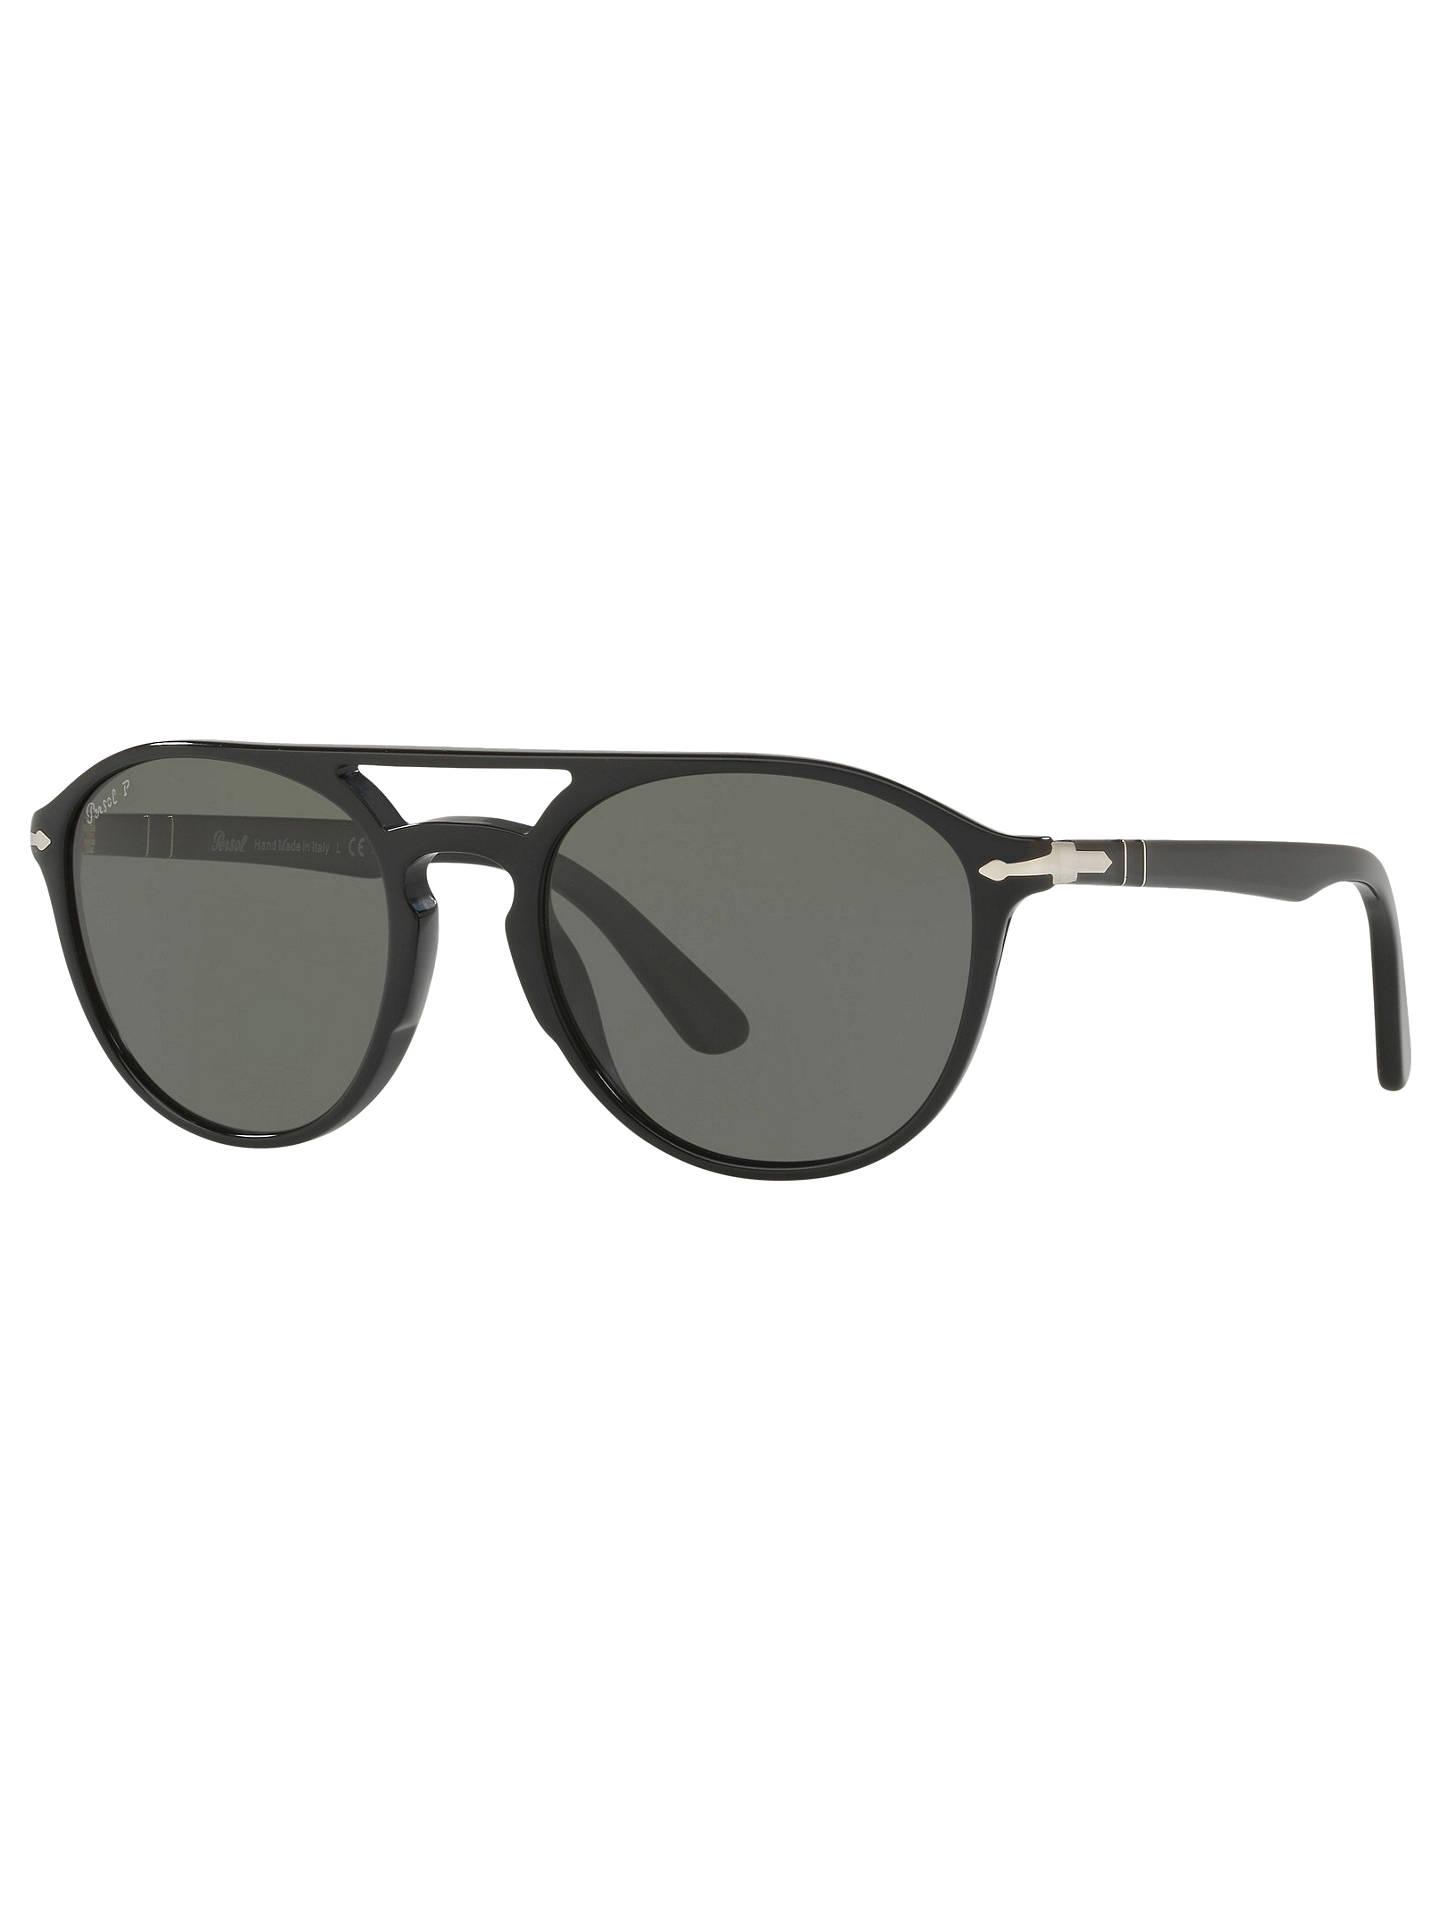 1cf02a24b4 Buy Persol PO3170S Polarised Oval Sunglasses